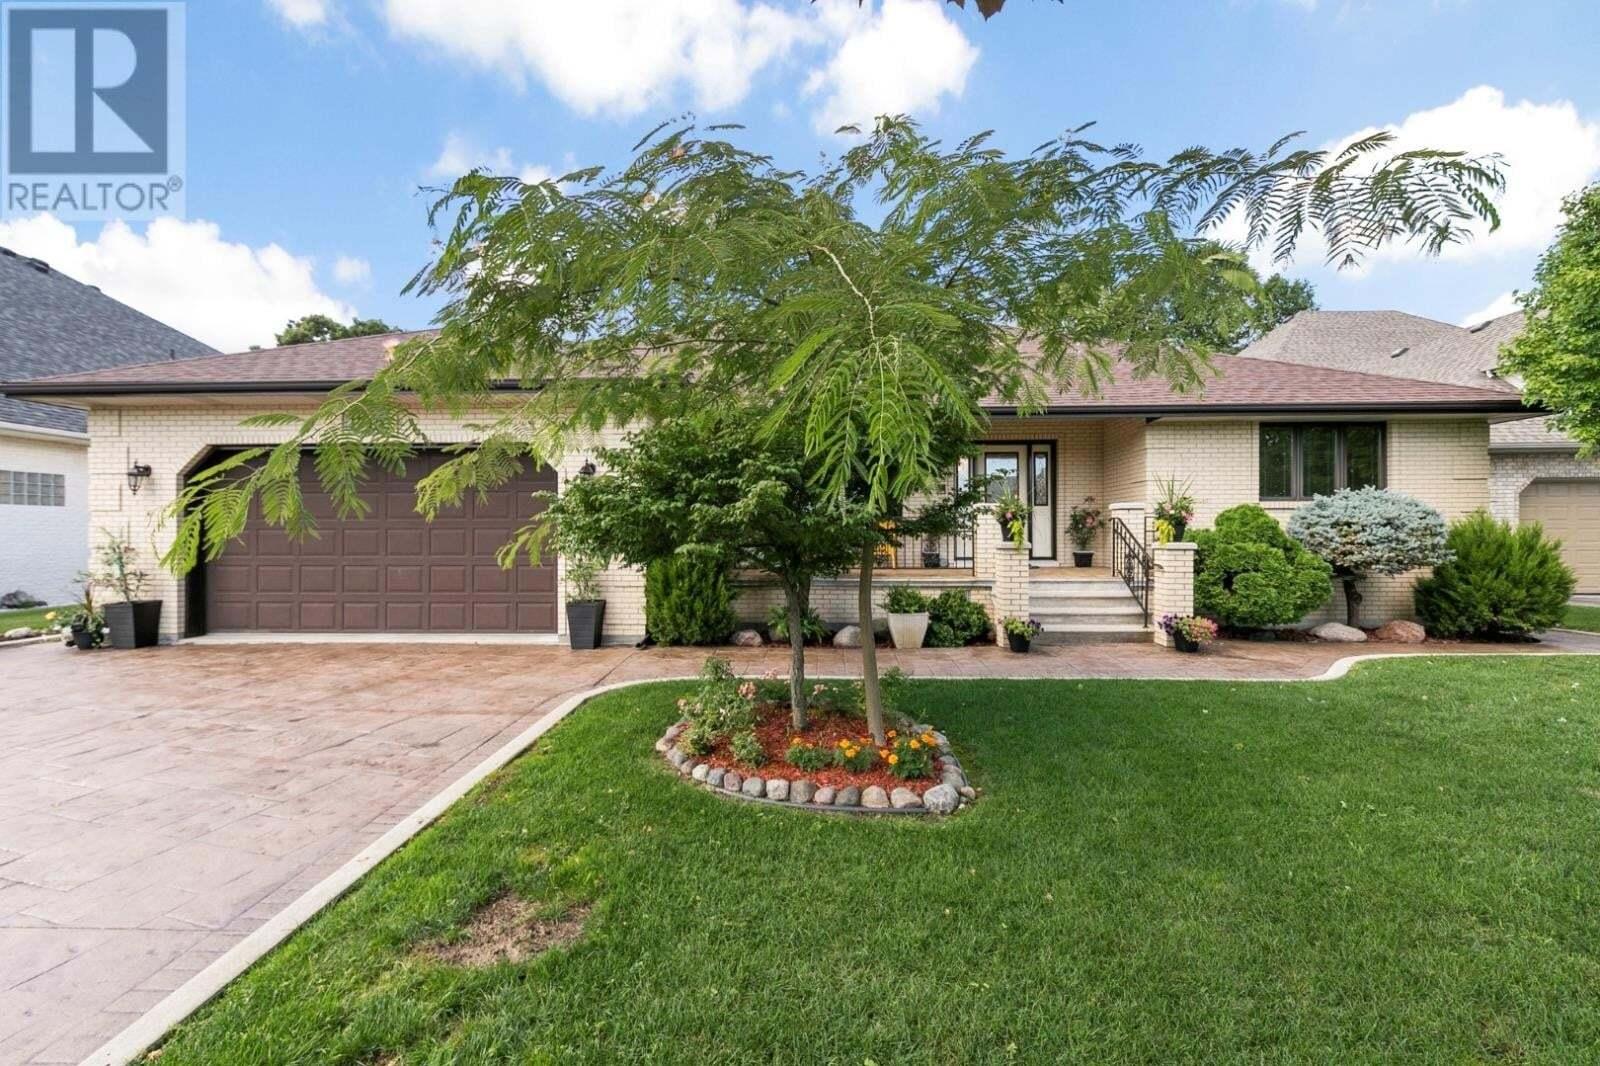 House for sale at 1715 Calvary  Tecumseh Ontario - MLS: 20009784